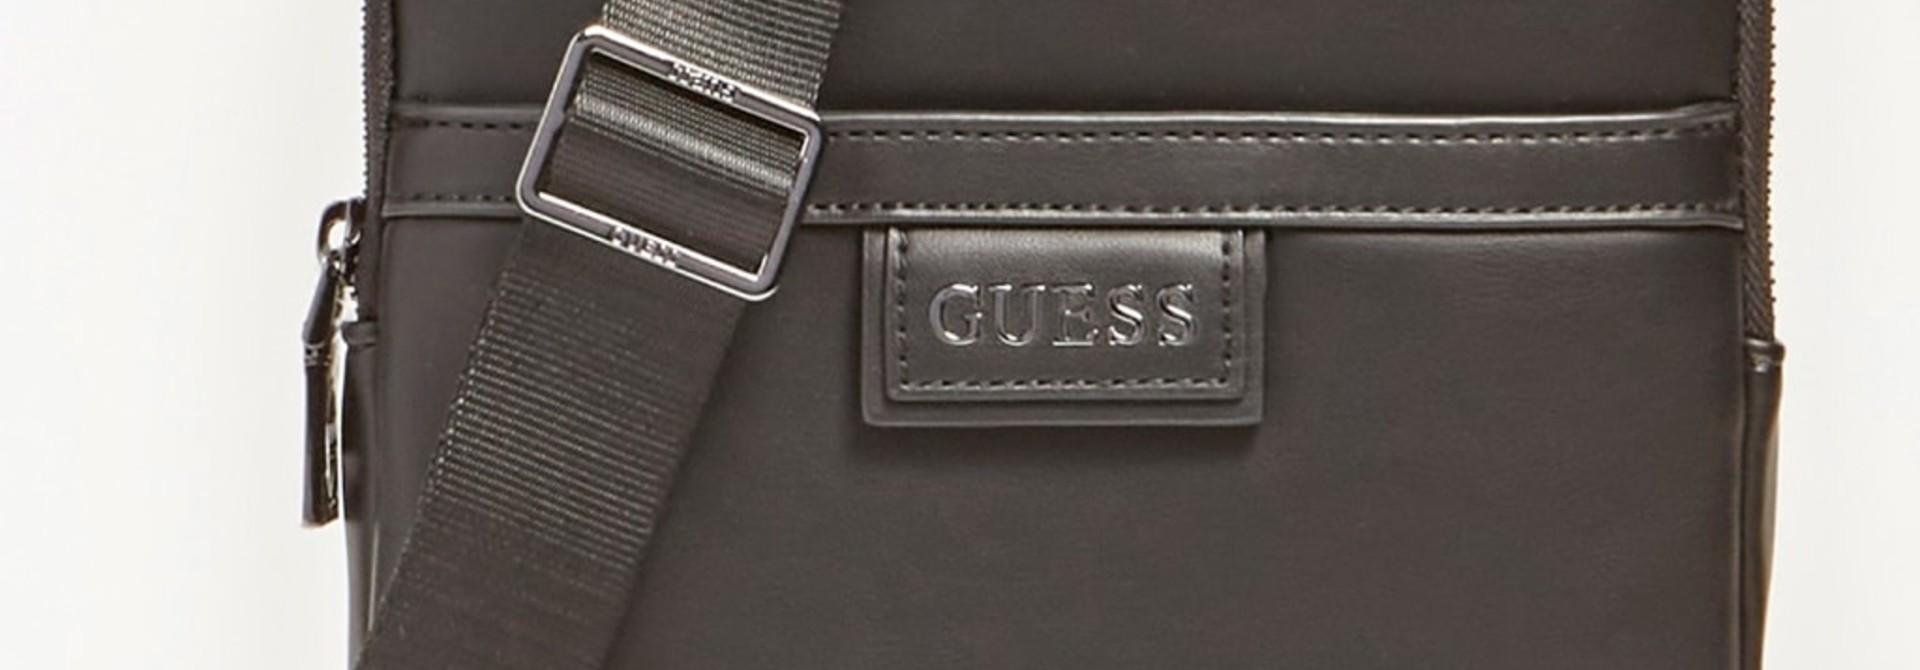 Guess/schoudertas black